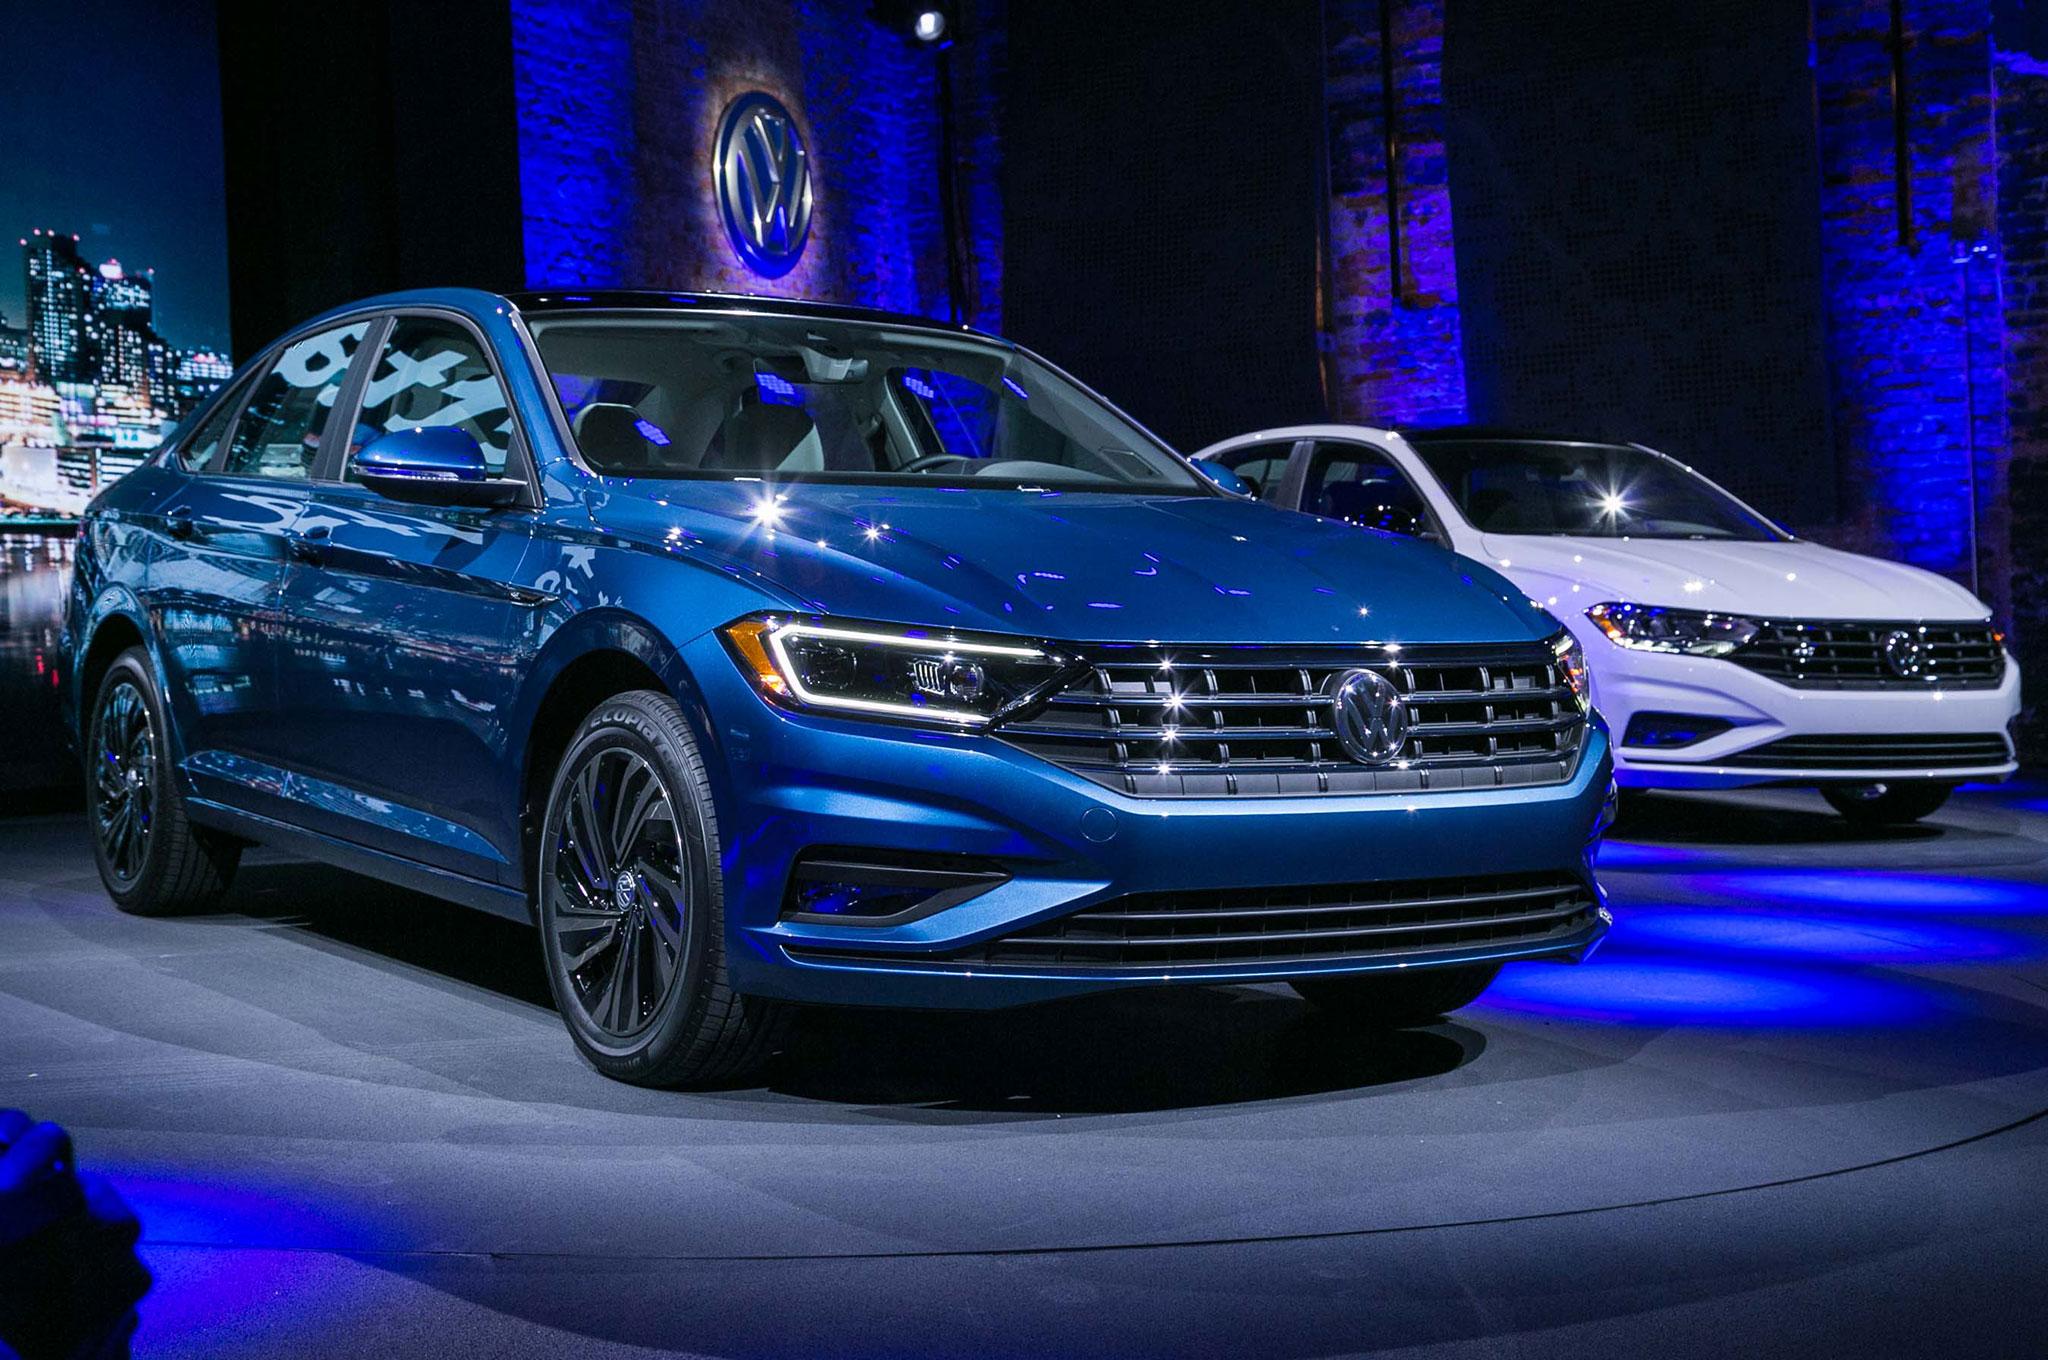 2019 Volkswagen Jetta Pair